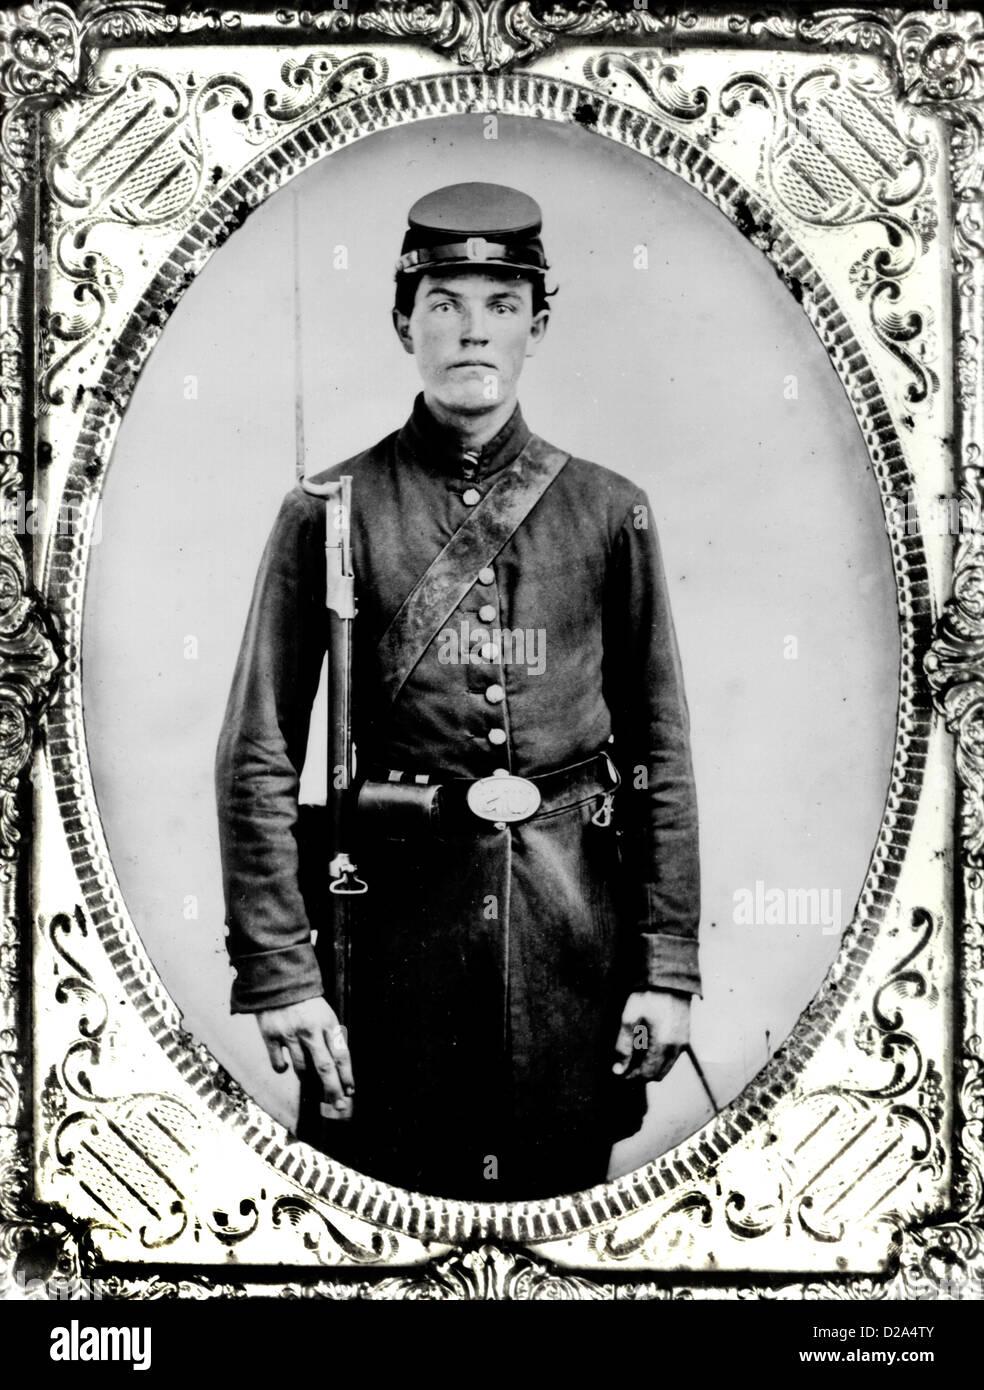 Black Soldier Civil War Stock Photos & Black Soldier Civil ... Young Civil War Union Soldiers